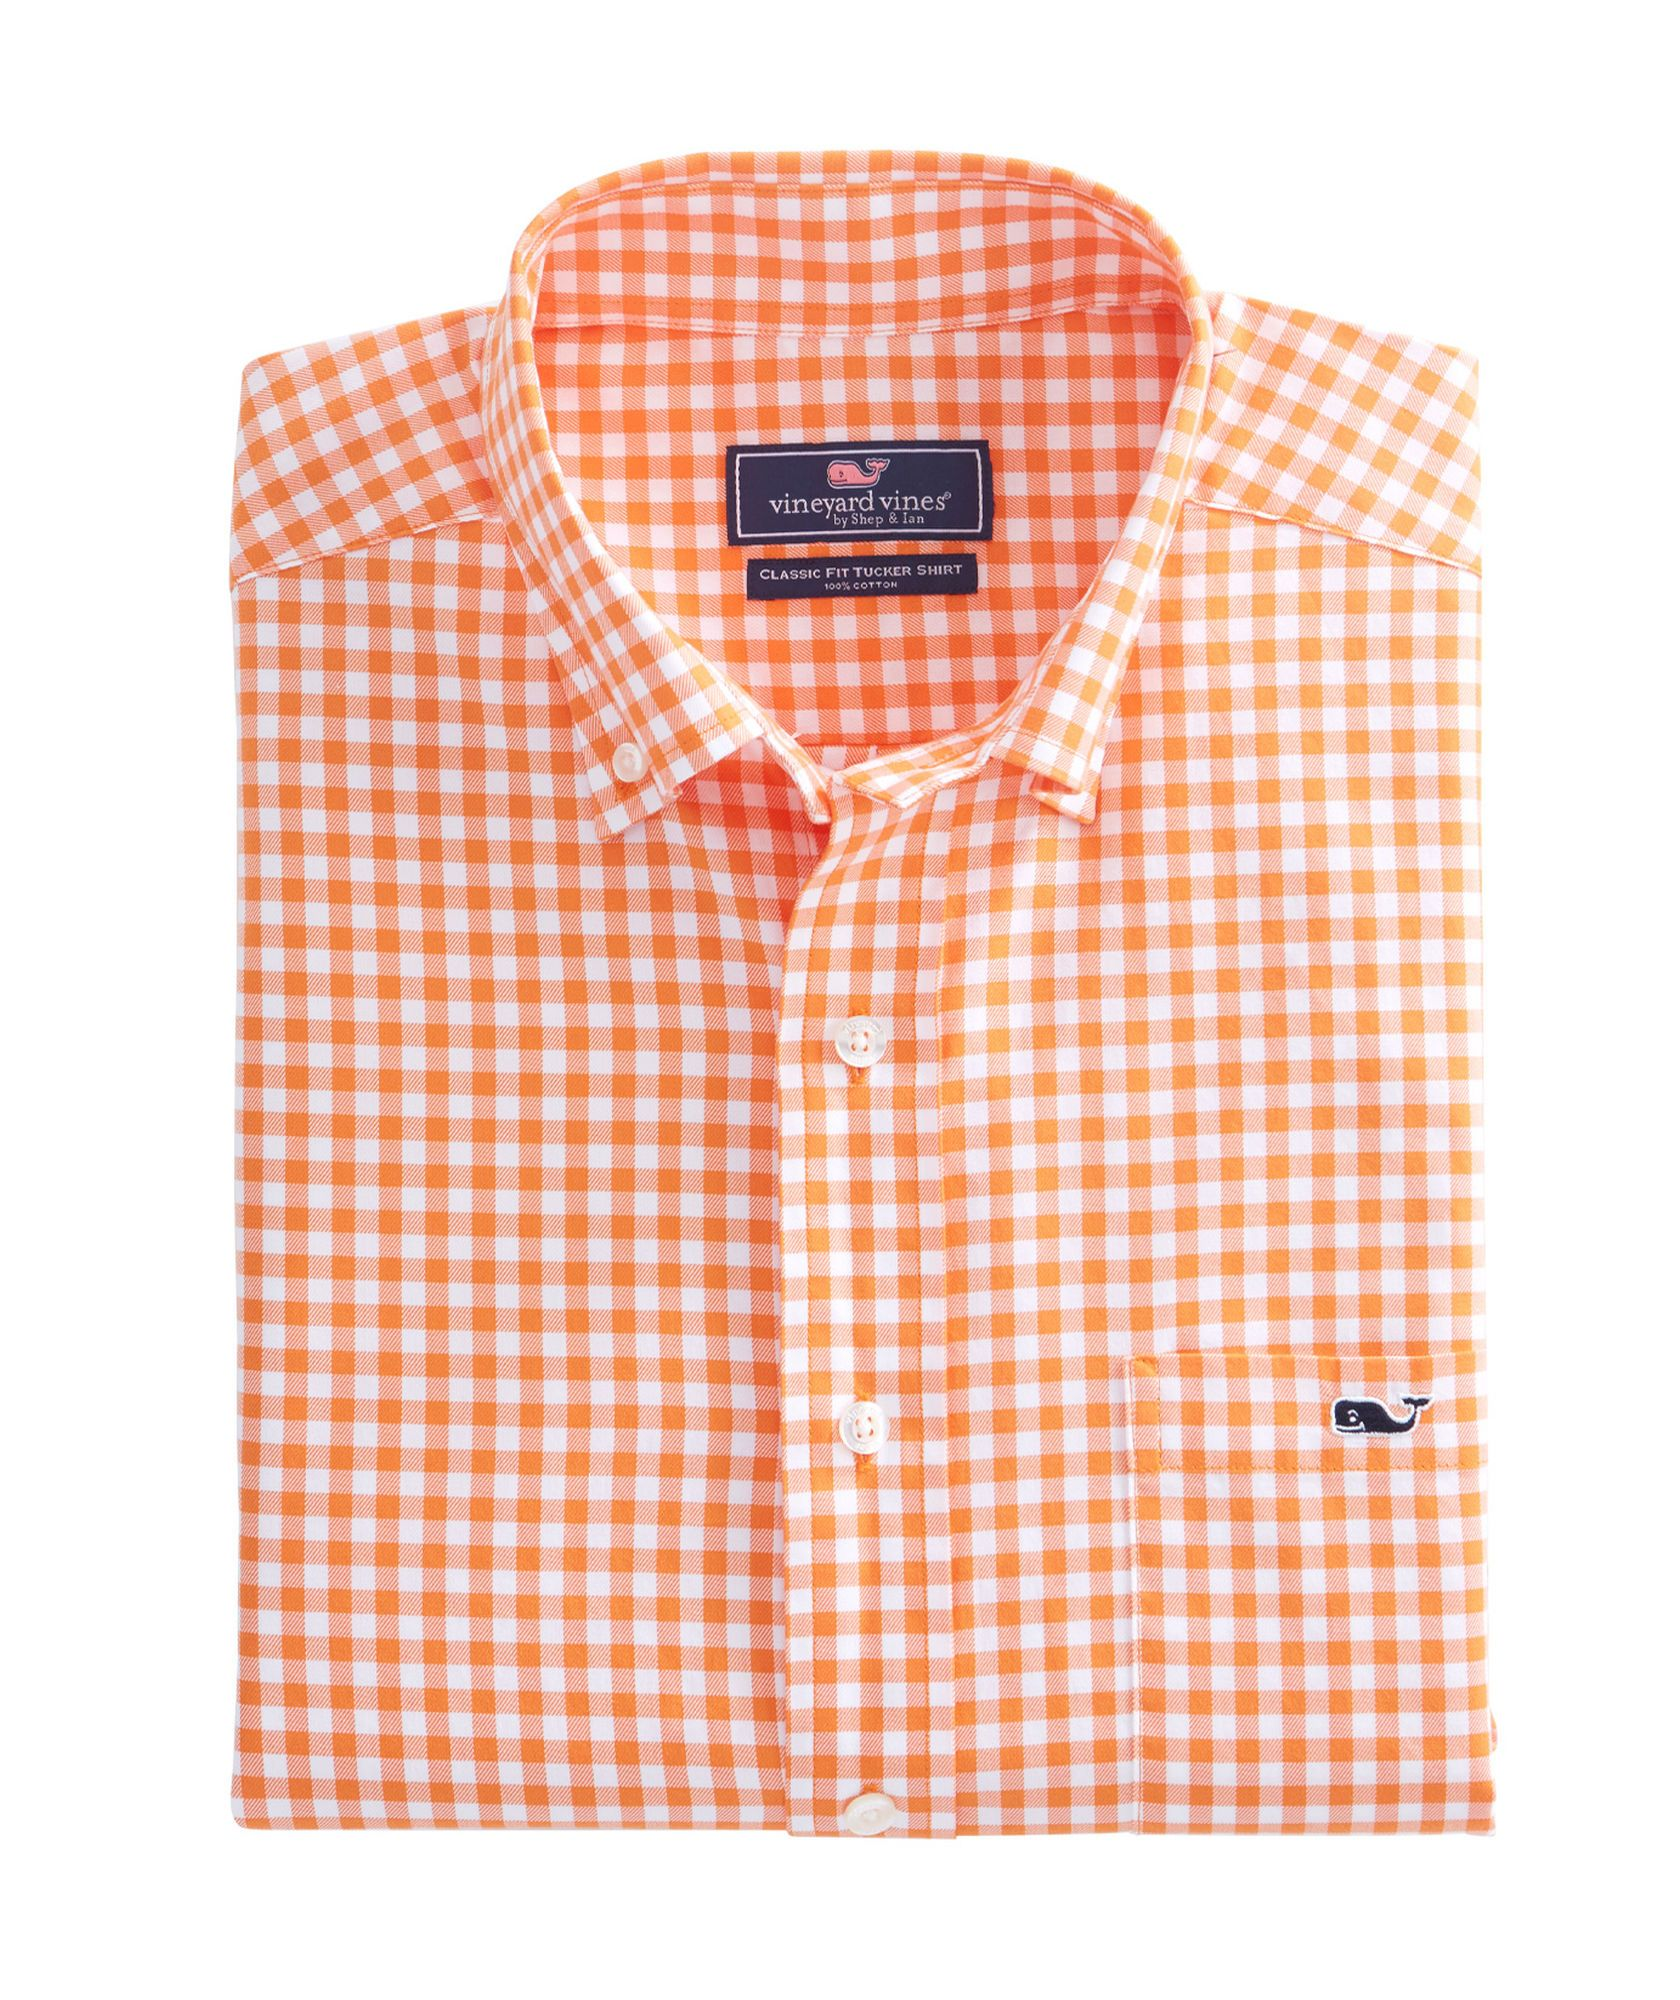 Nottingham Gingham Classic Tucker Shirt  9b0052d84